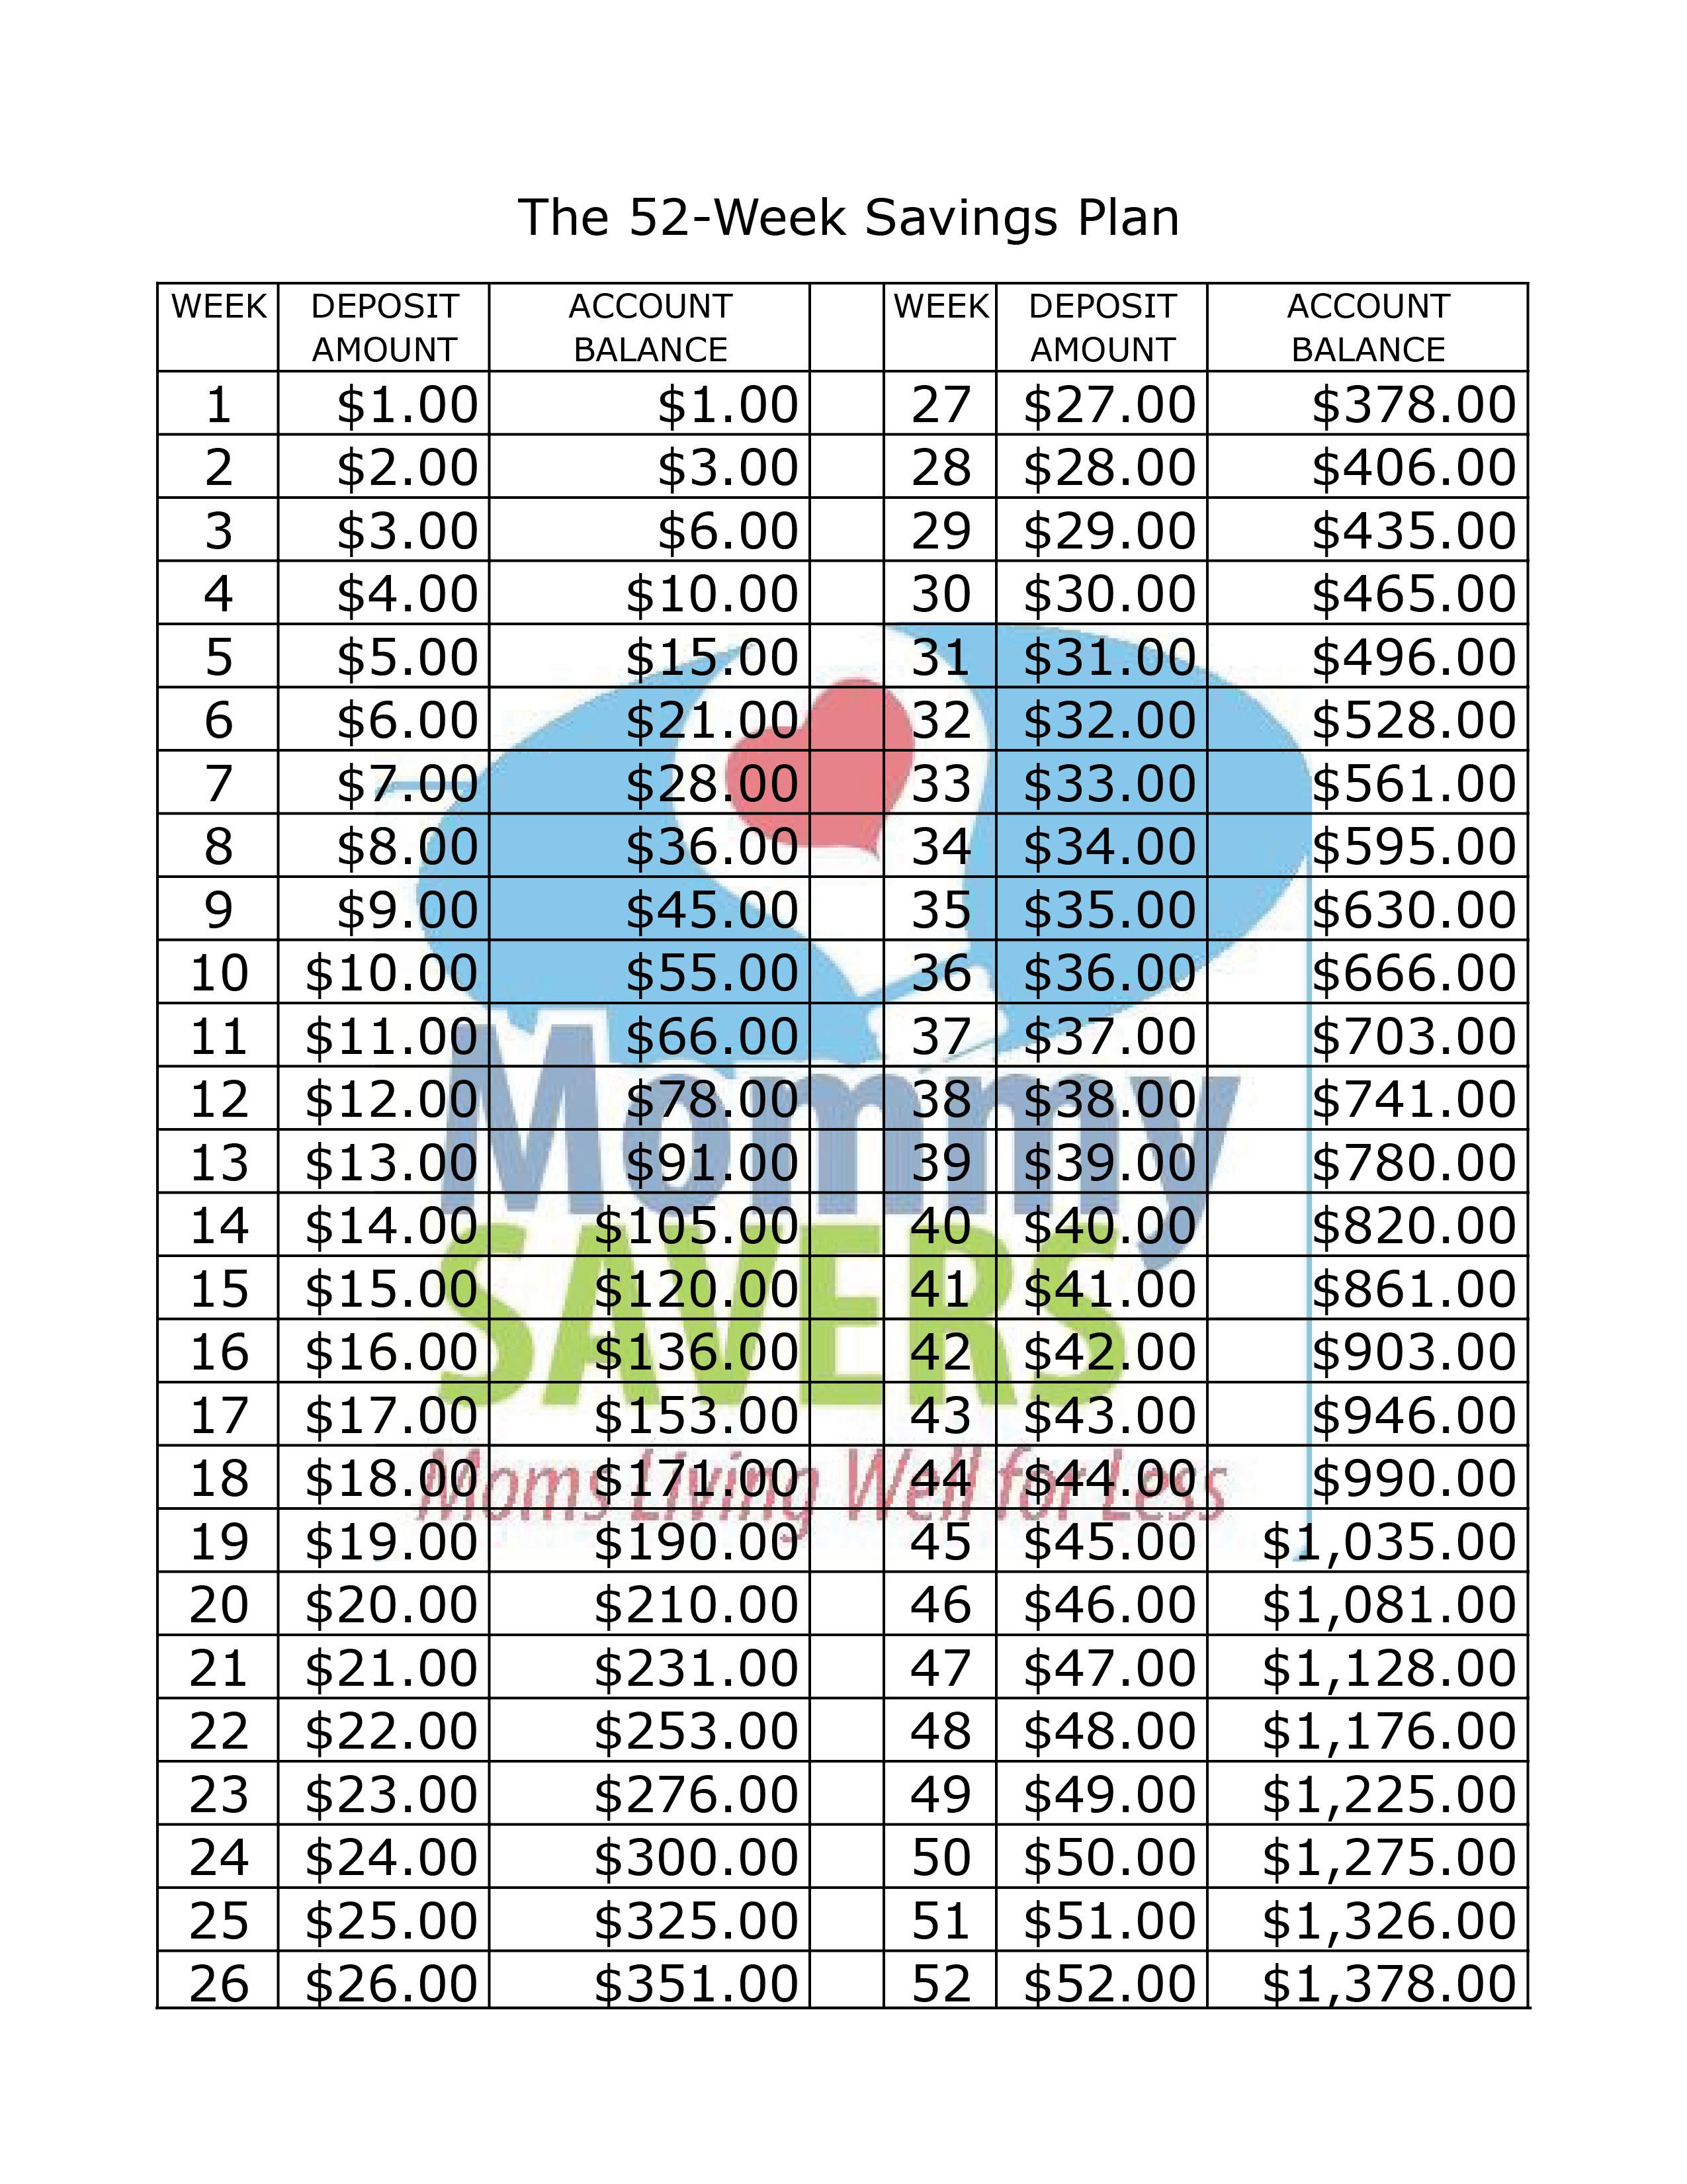 The 52 Week Savings Plan Printable Chart